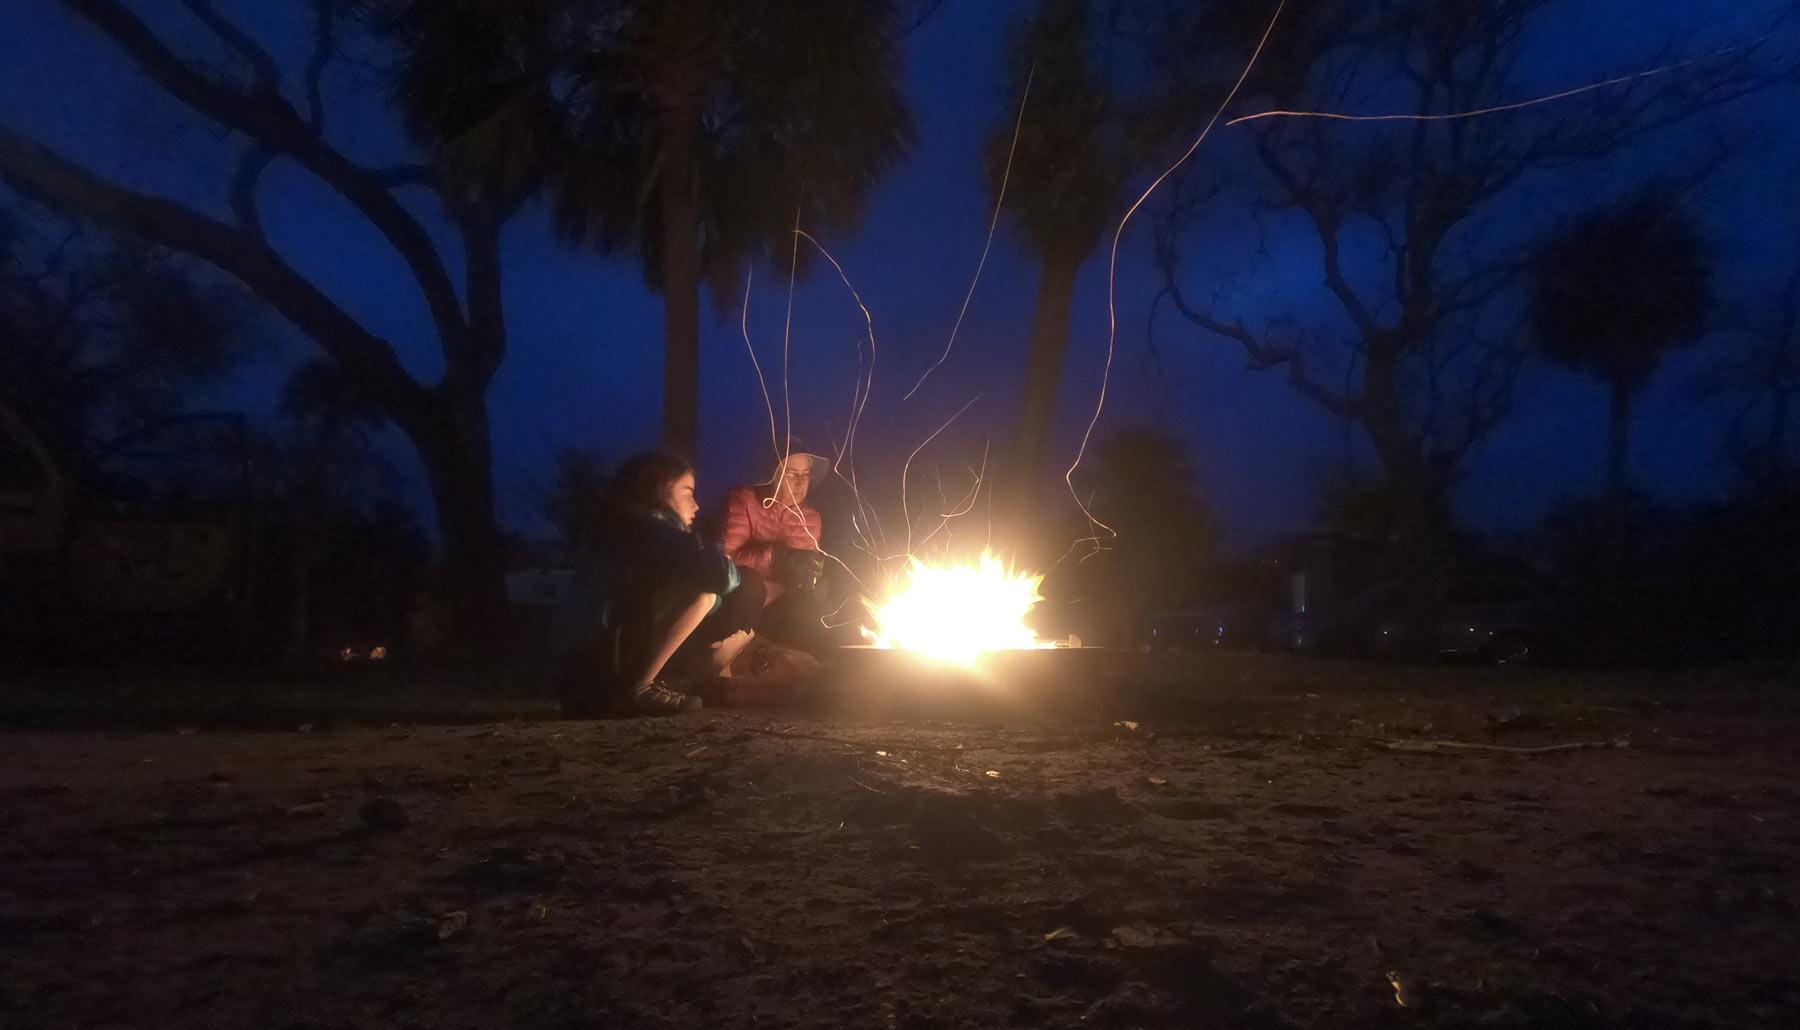 Family gathered around glowing campfire at night at Hunting Island State Park, South Carolina